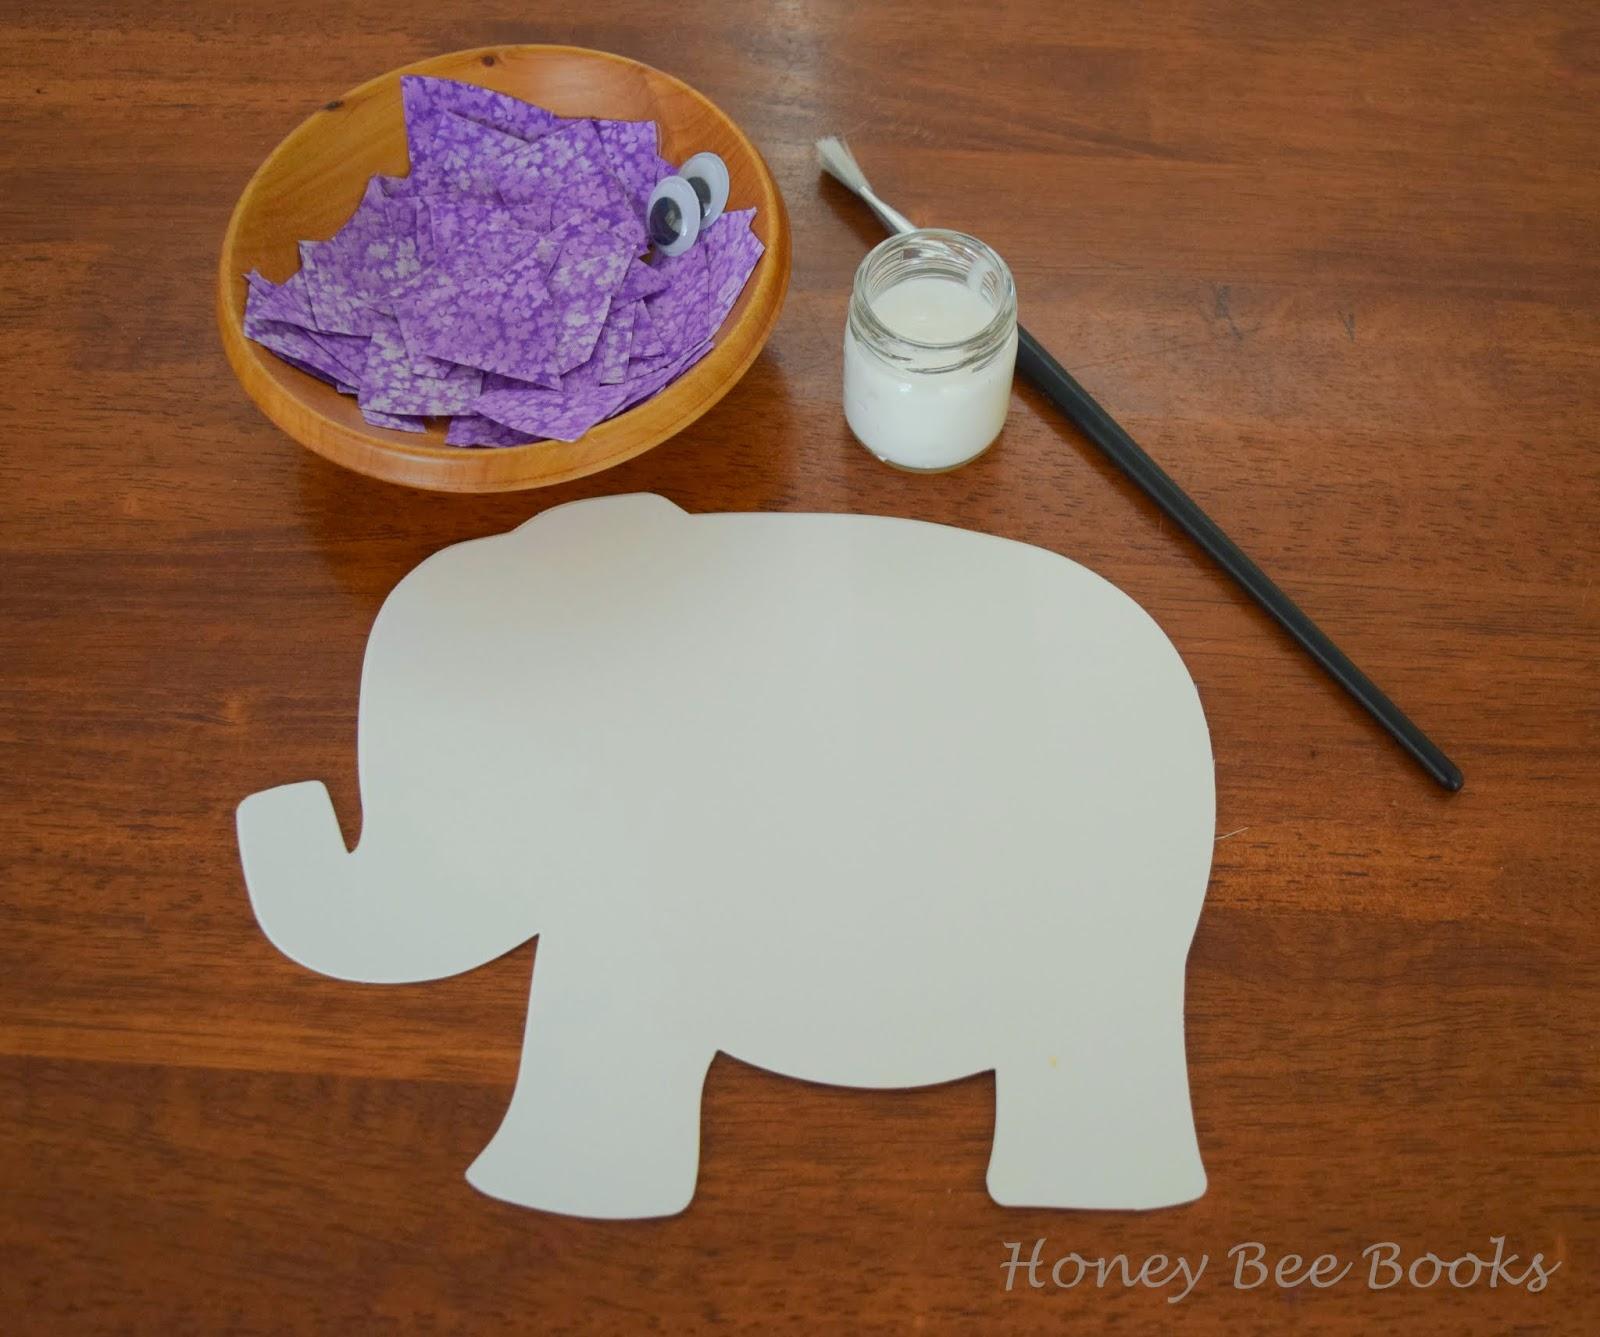 An invitation to create a purple elephant collage